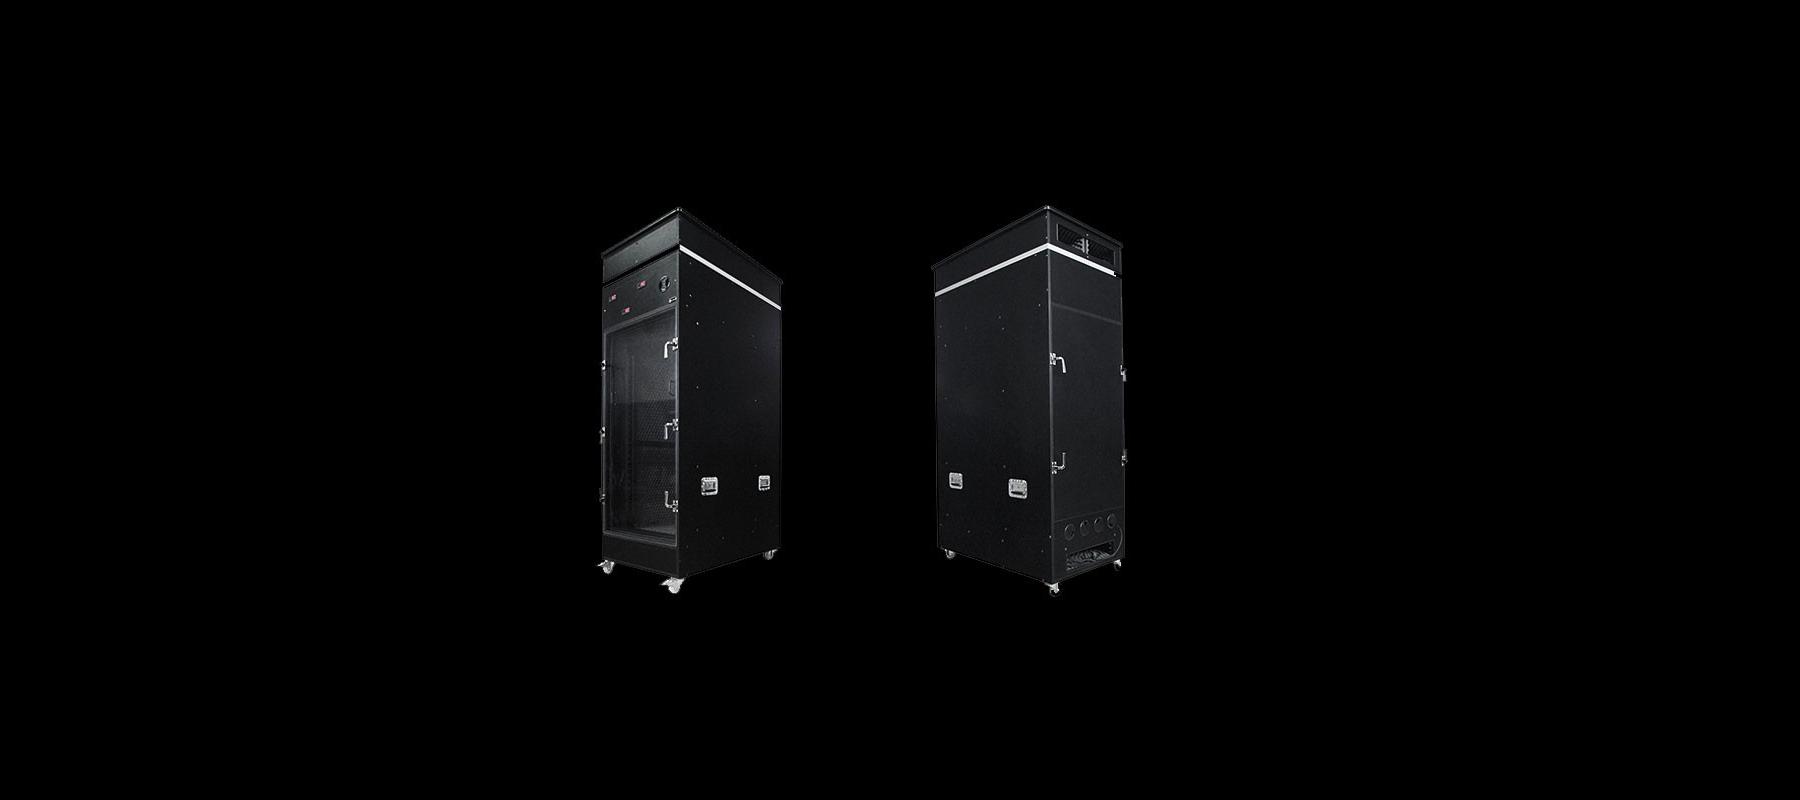 Soundproof box Silent Server Rack 8 - 24 U